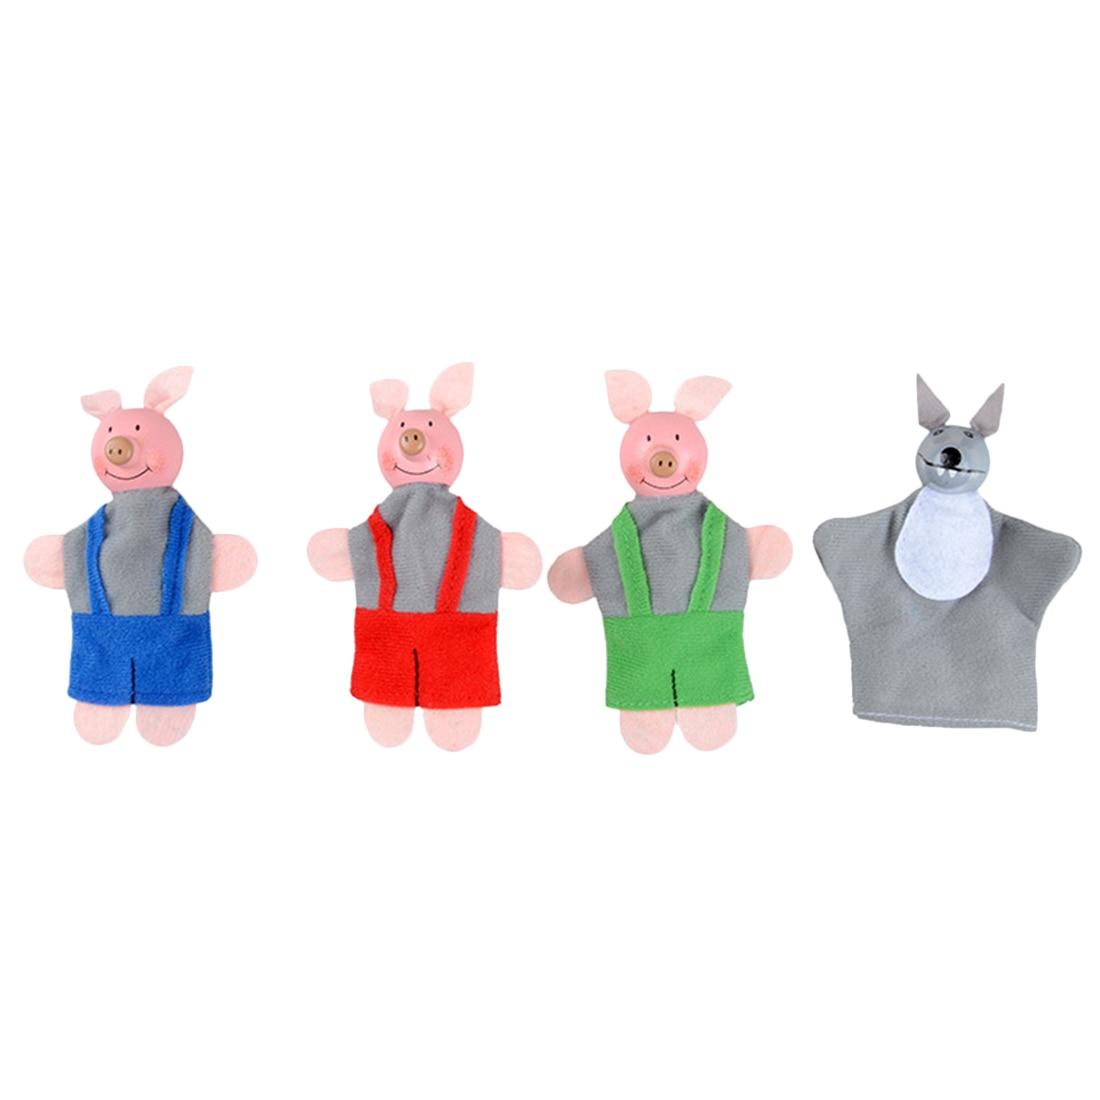 Surwish-4Pcs-Soft-Plush-Three-Little-Pigs-Fairy-Tale-Finger-Puppet-Set-Children-Story-Telling-Helper-Dolls-1